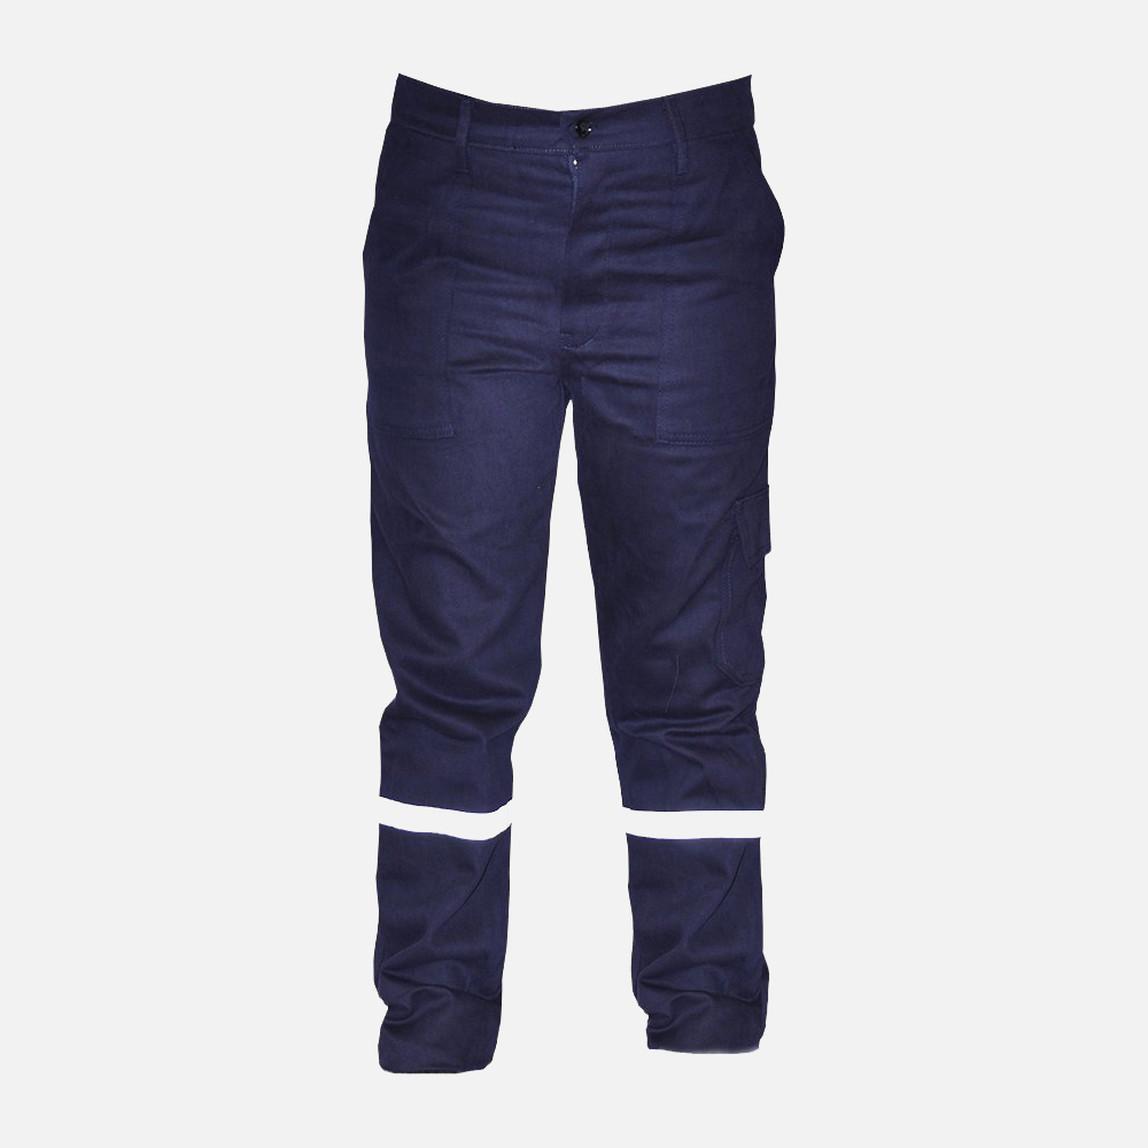 İş Pantolonu %100 Pamuk S Beden Lacivert